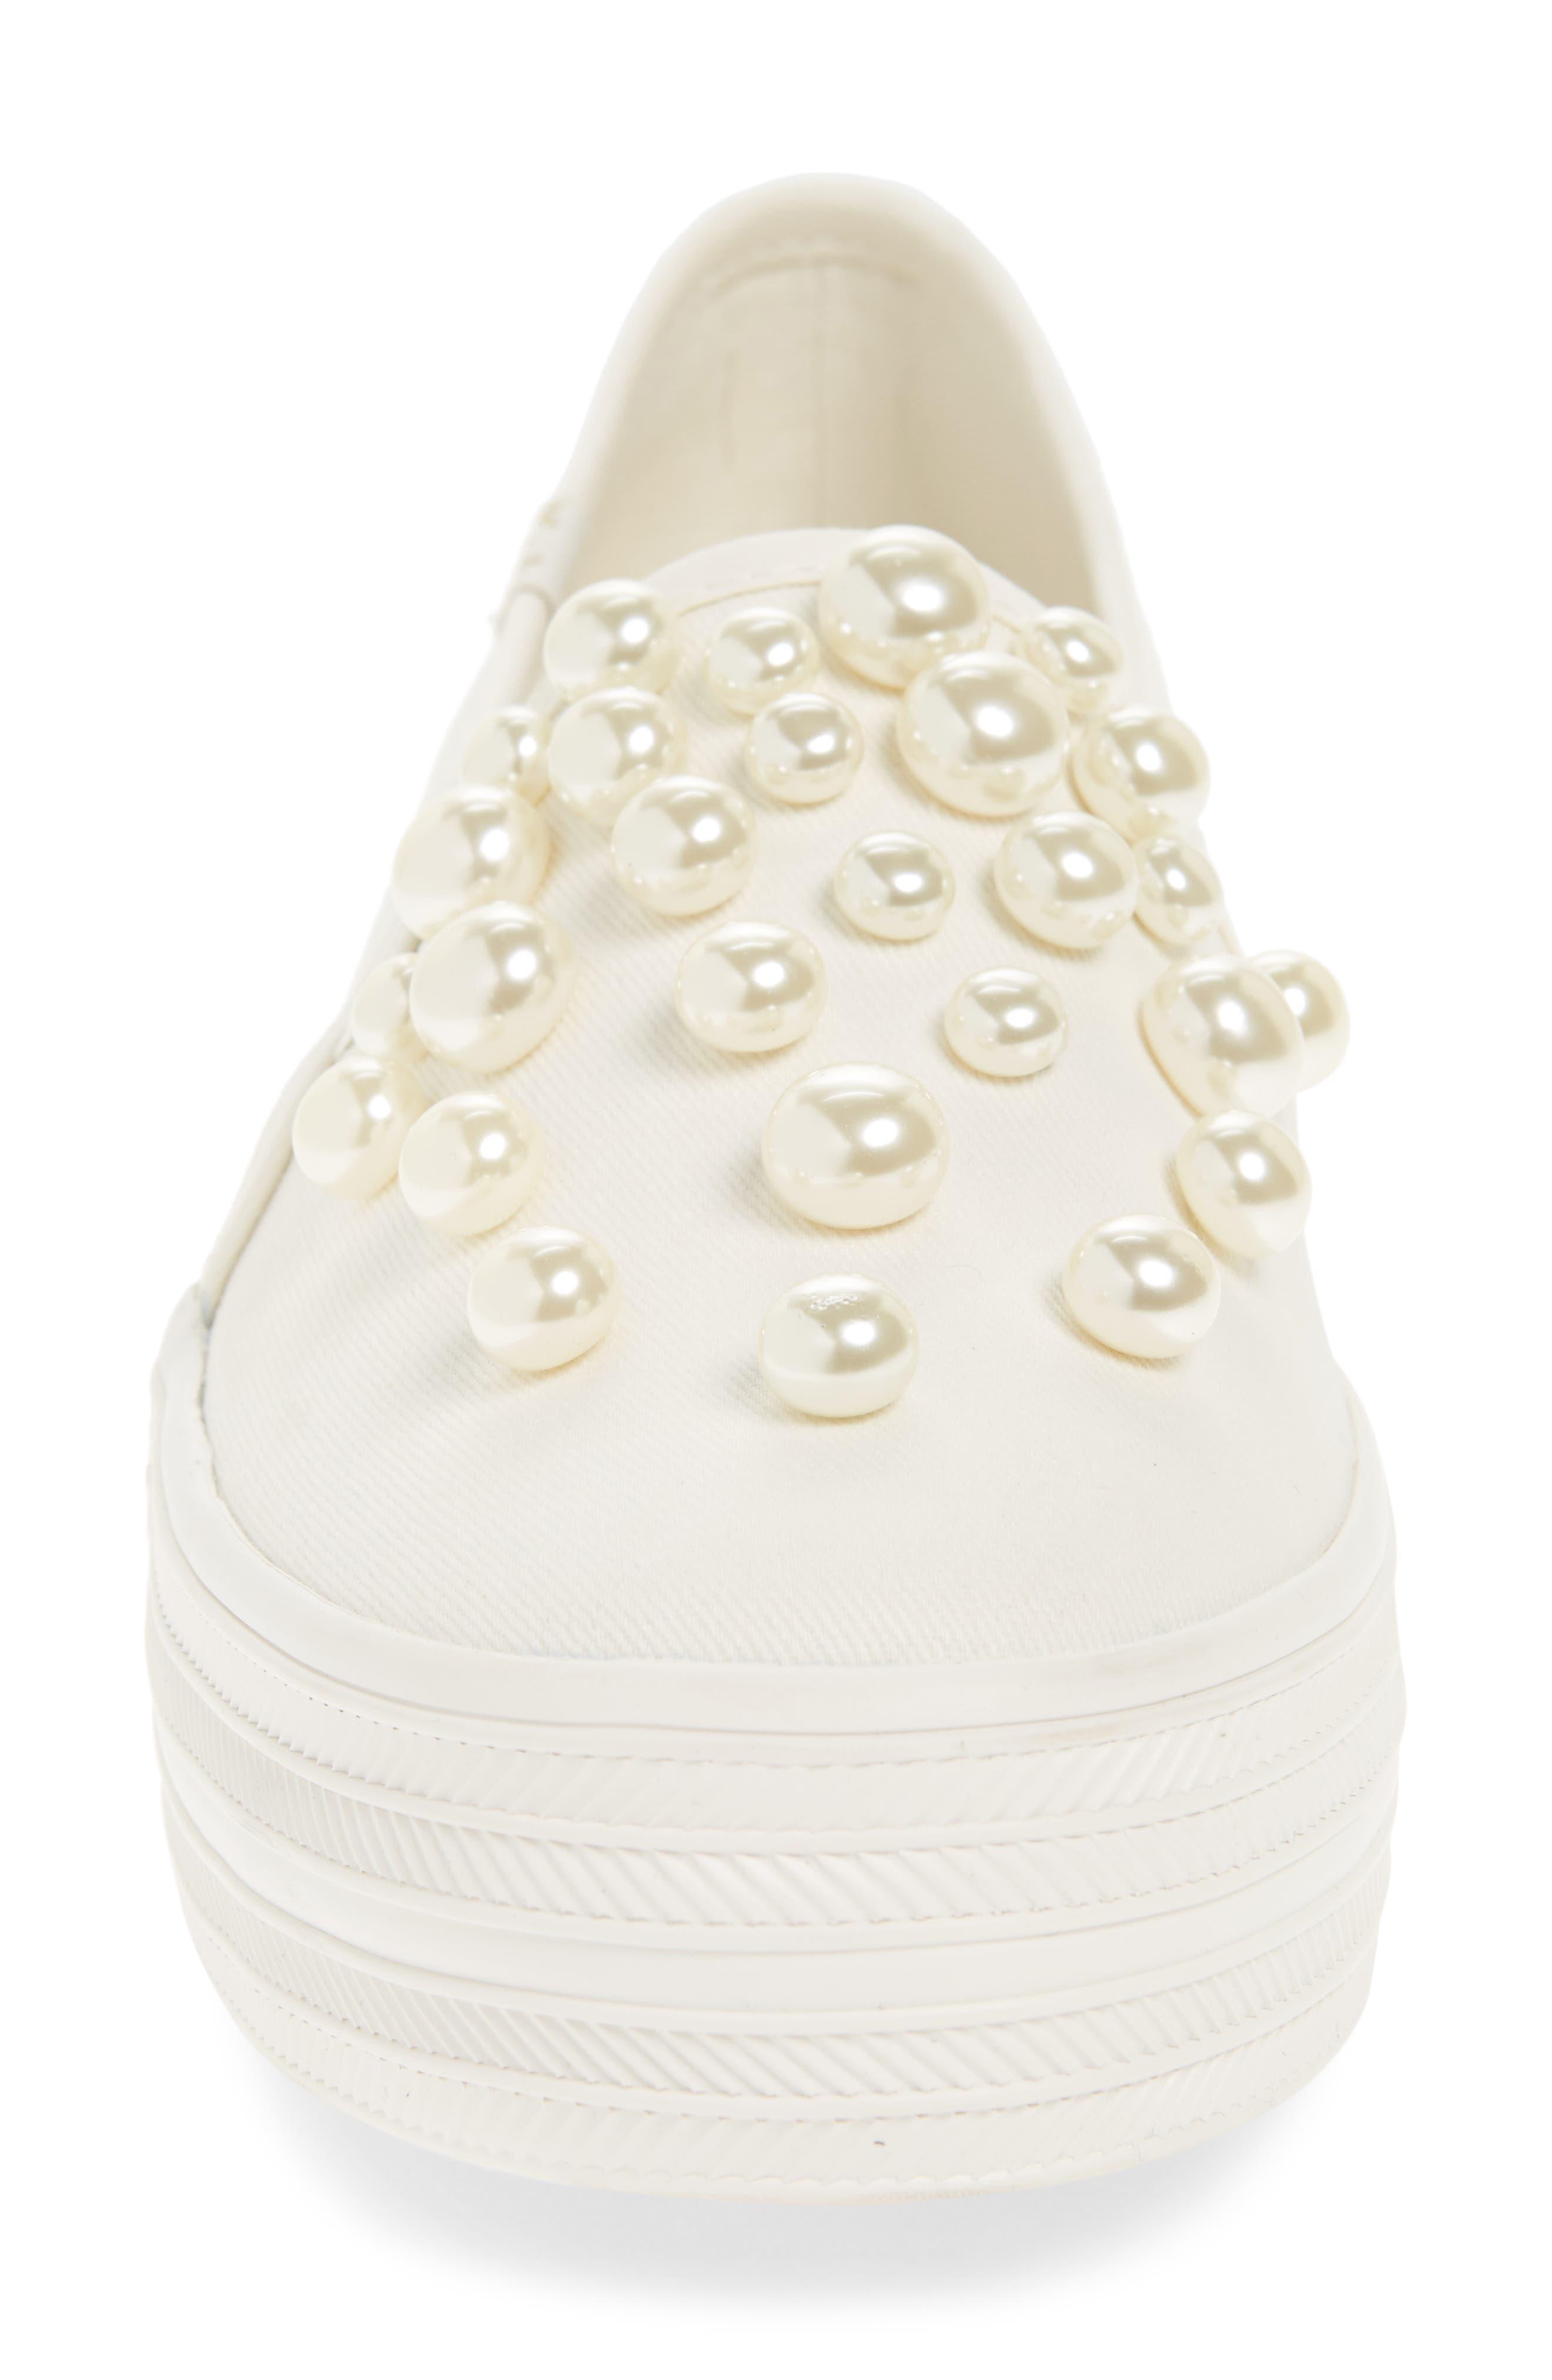 KEDS<SUP>®</SUP> FOR KATE SPADE NEW YORK, triple decker embellished slip-on sneaker, Alternate thumbnail 4, color, CREAM